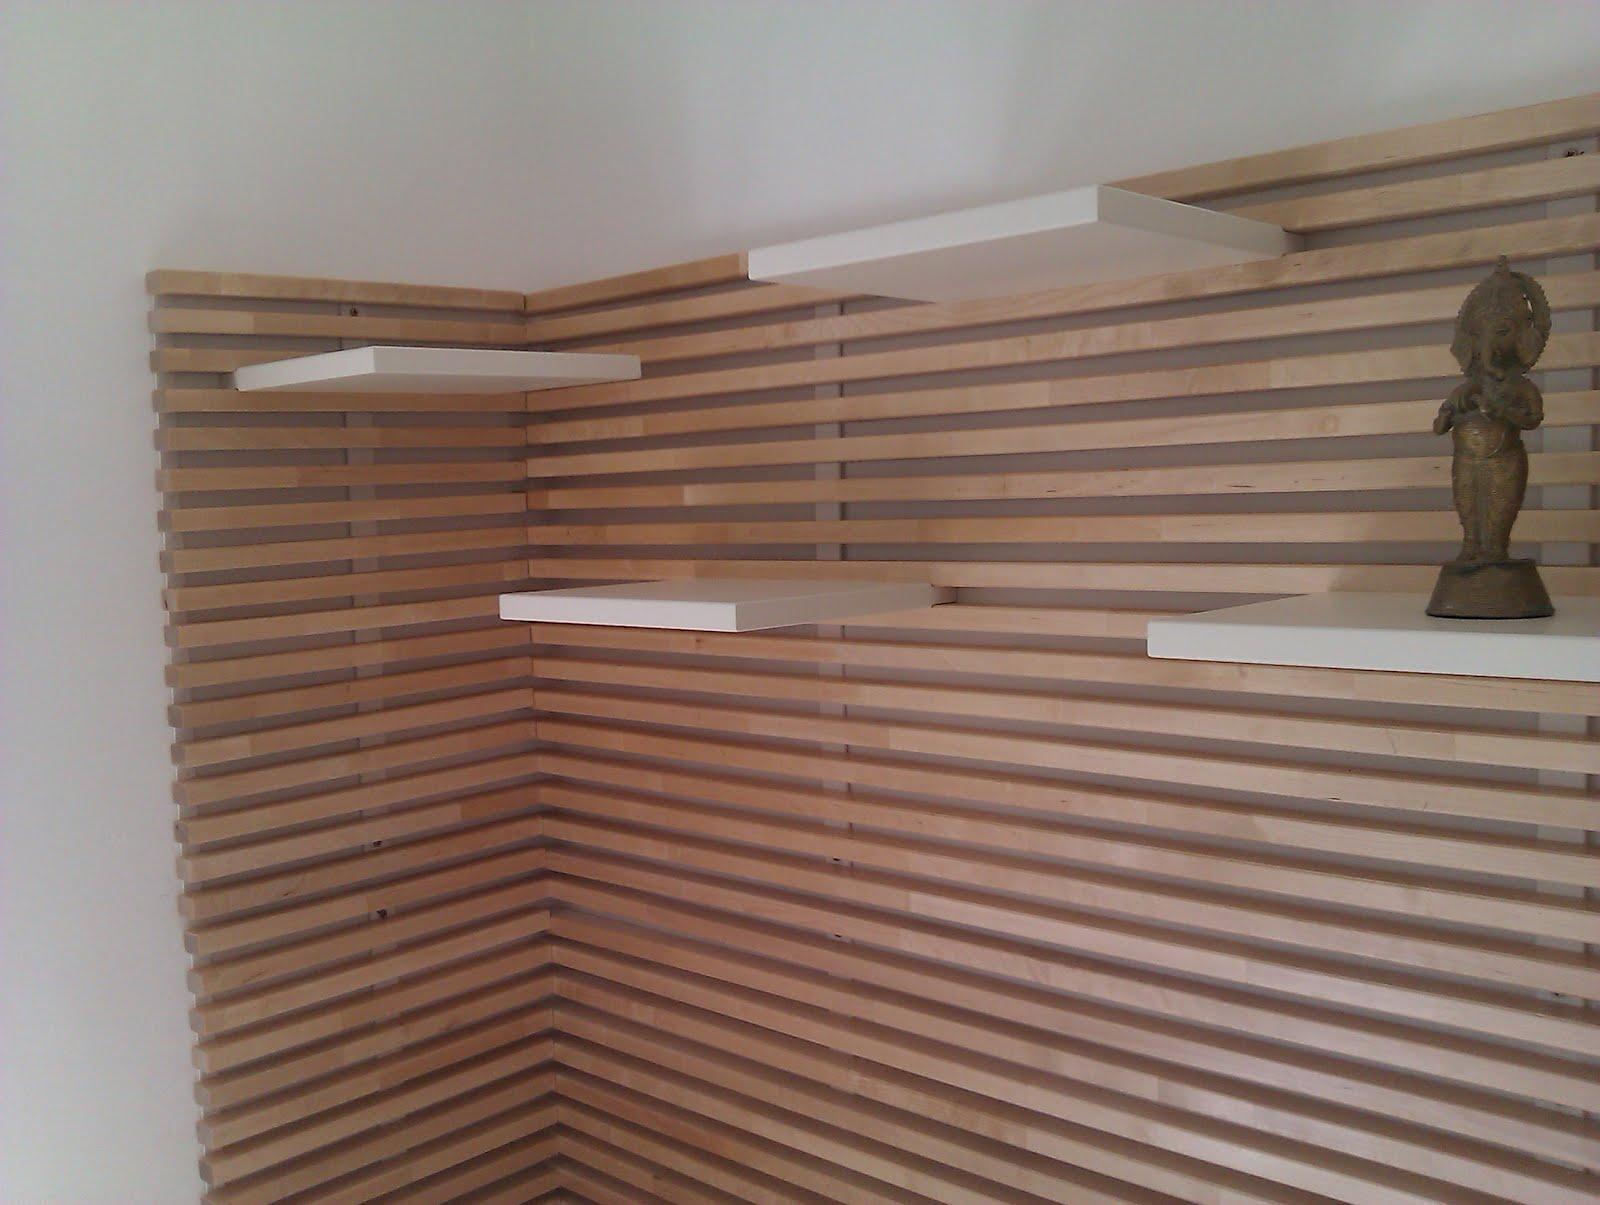 best wood slat wall ideas  loccie better homes gardens ideas